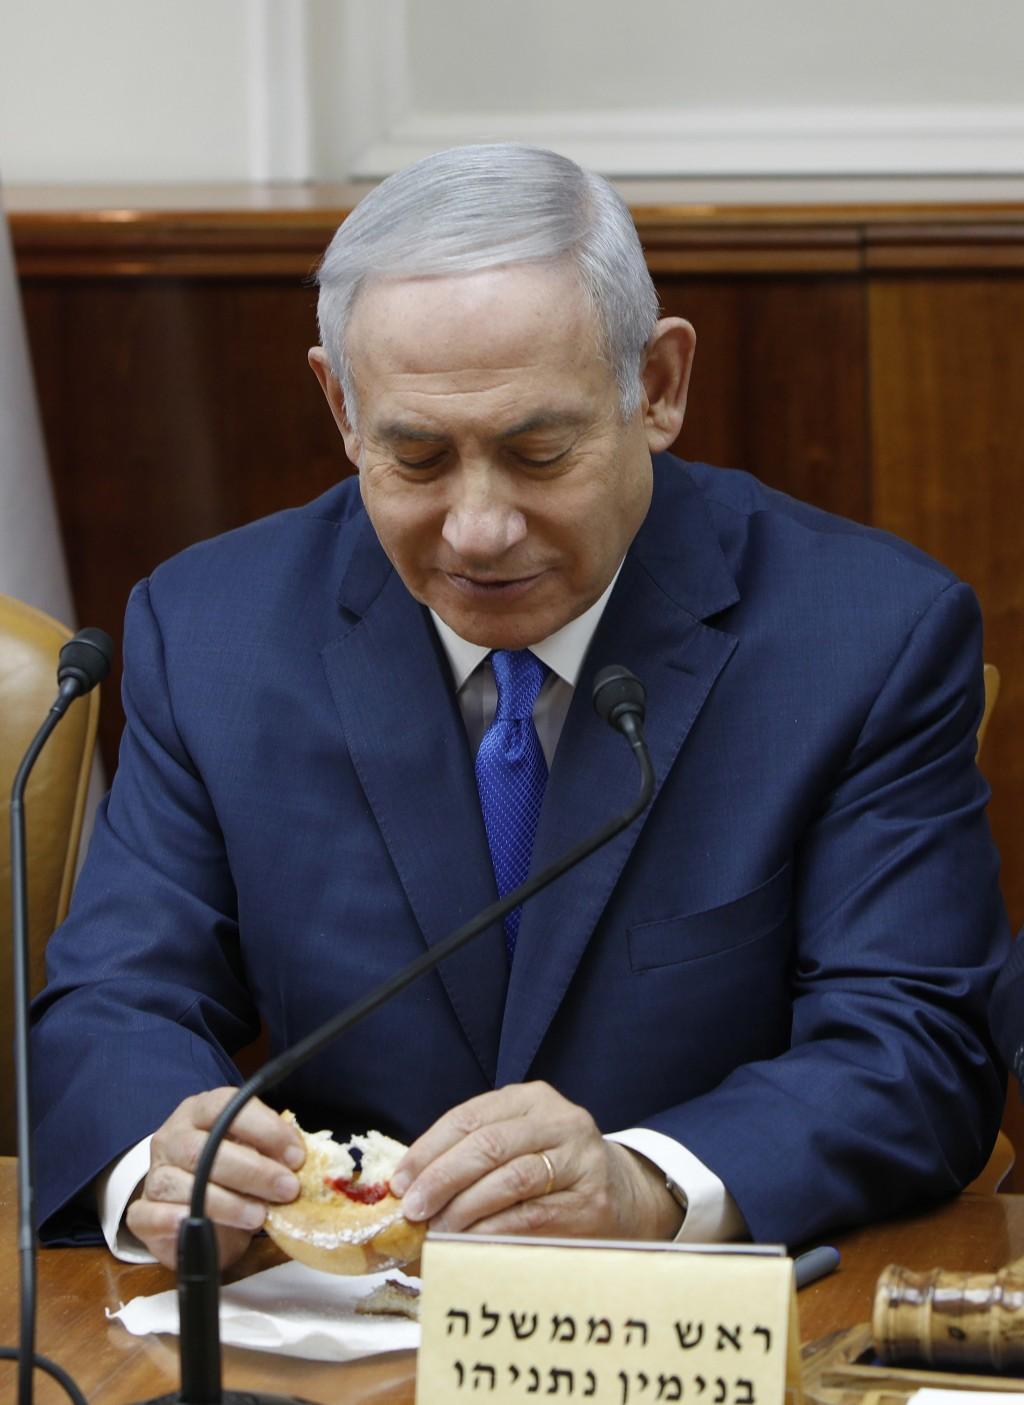 Israeli Prime Minister Benjamin Netanyahu attends the weekly cabinet meeting at his office in Jerusalem, Sunday Dec. 2, 2018.  Israeli police on Sunda